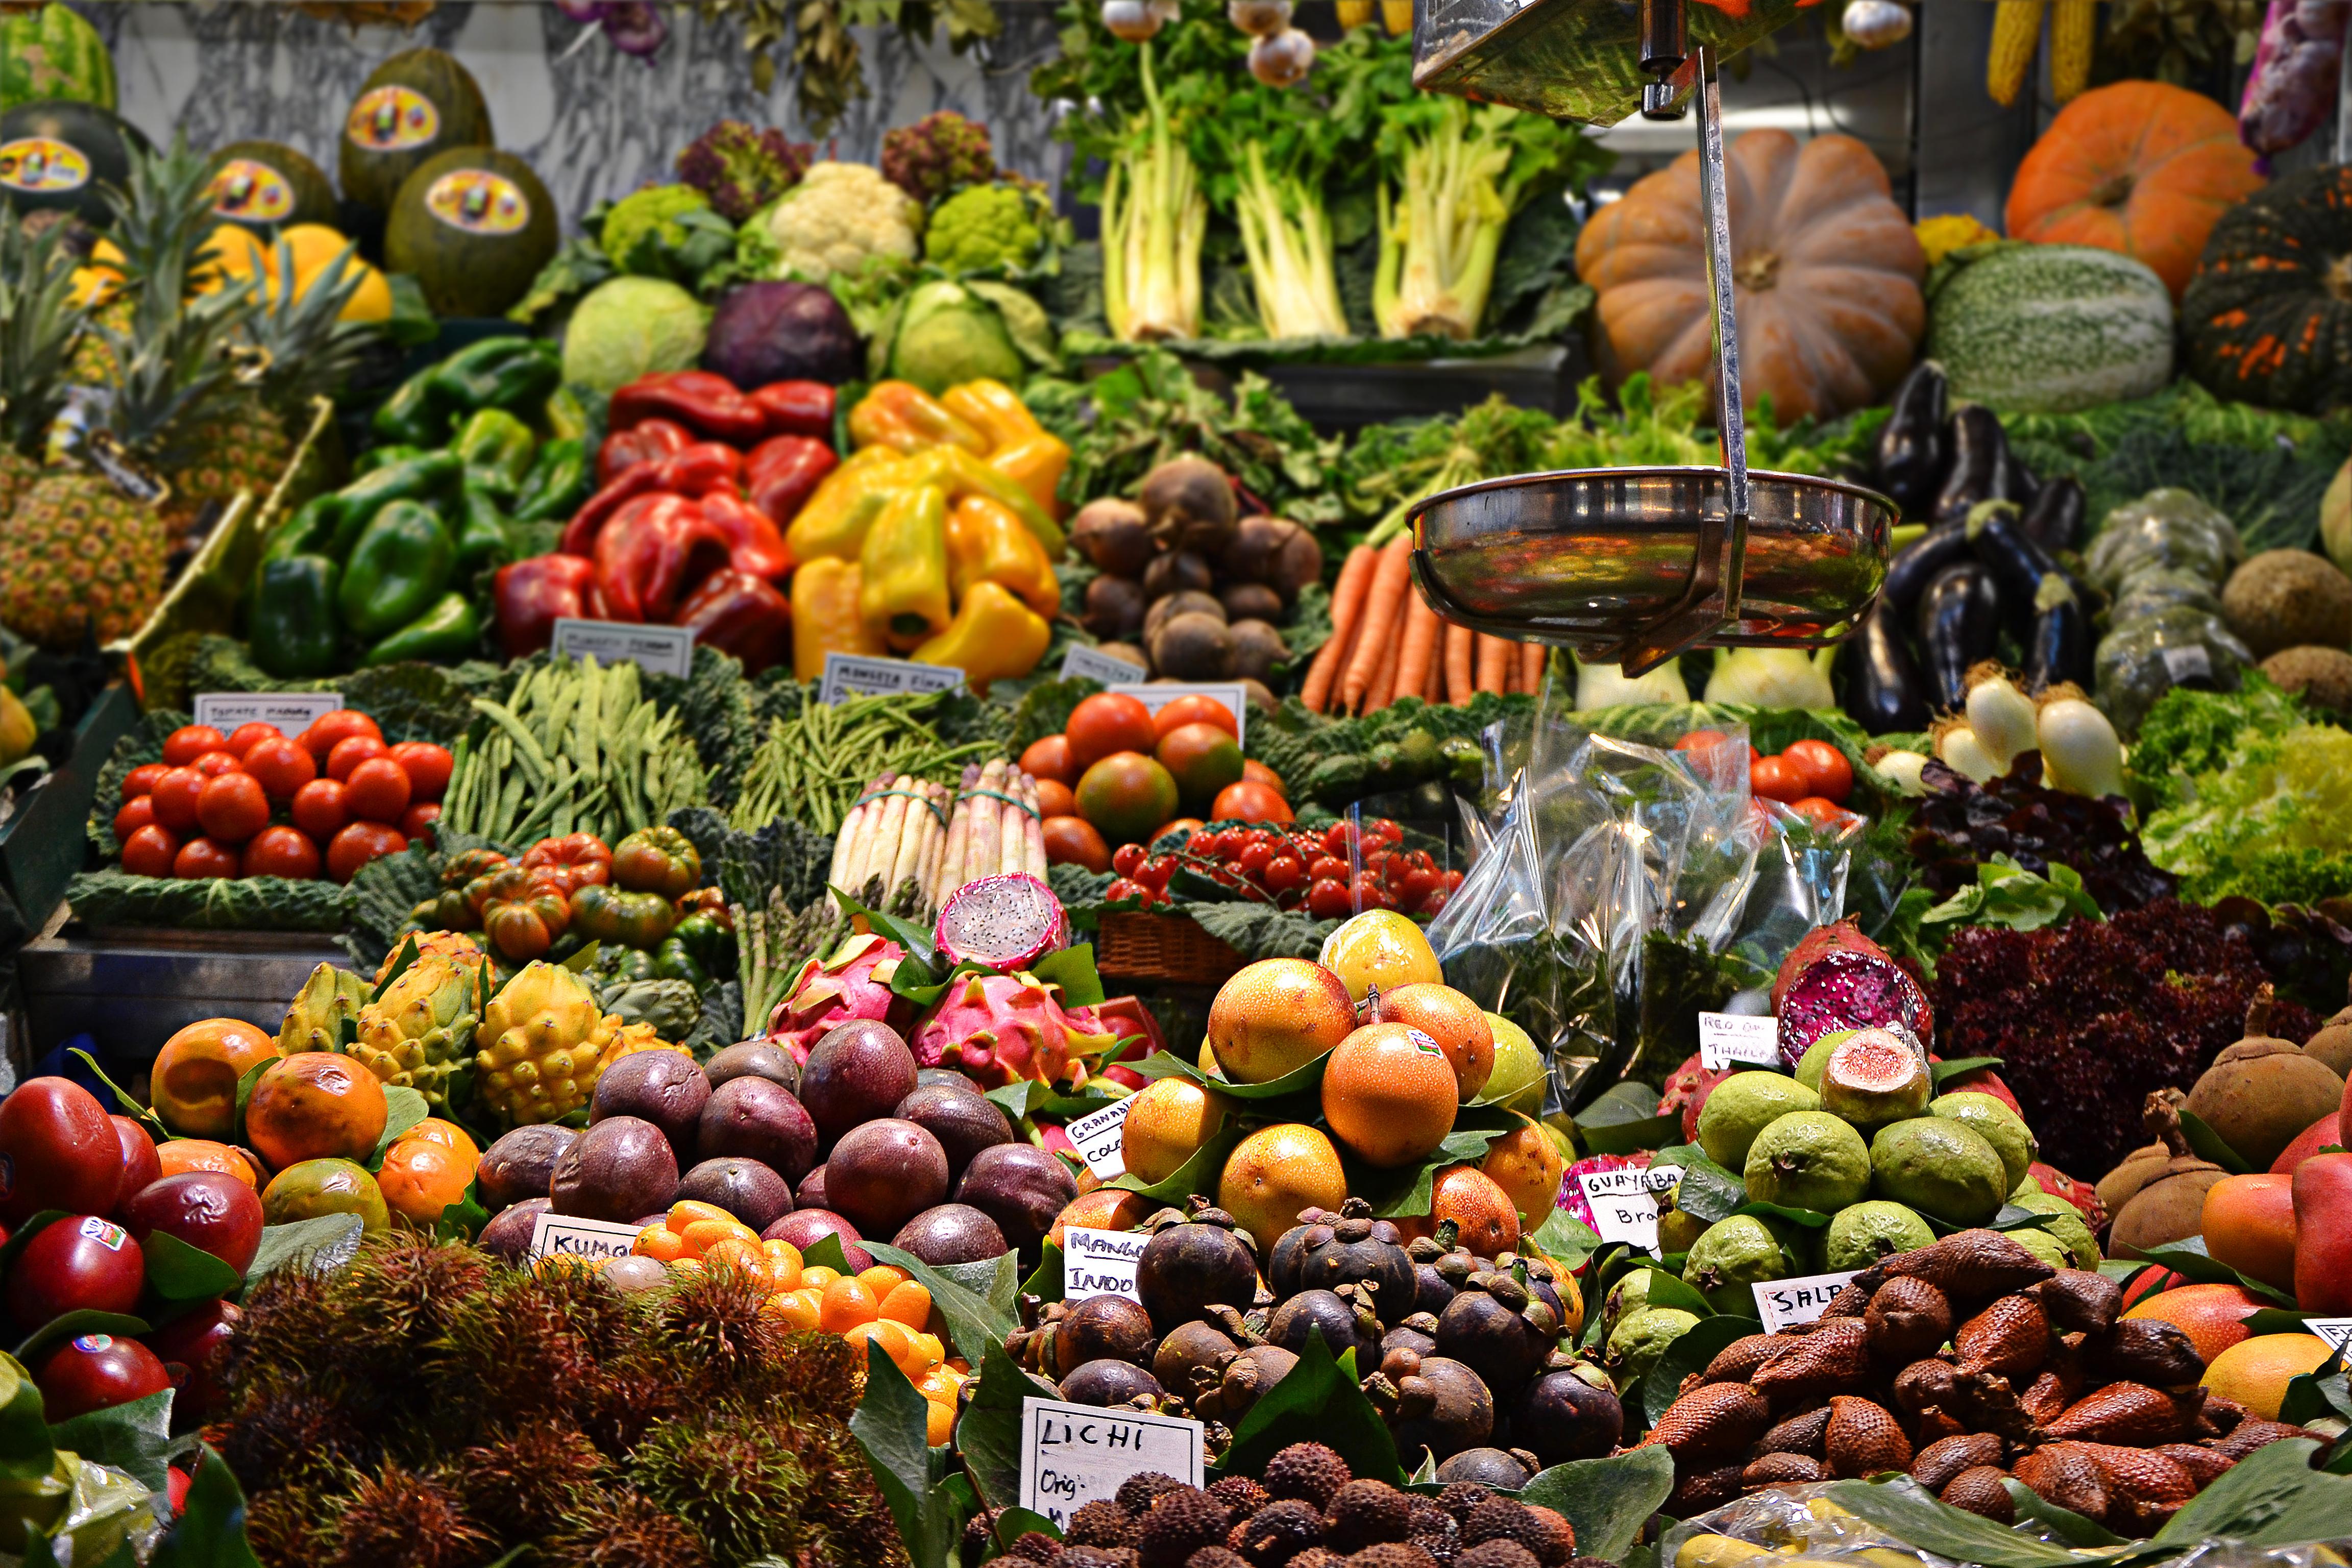 Free Images : fruit, flower, city, produce, autumn, market ...